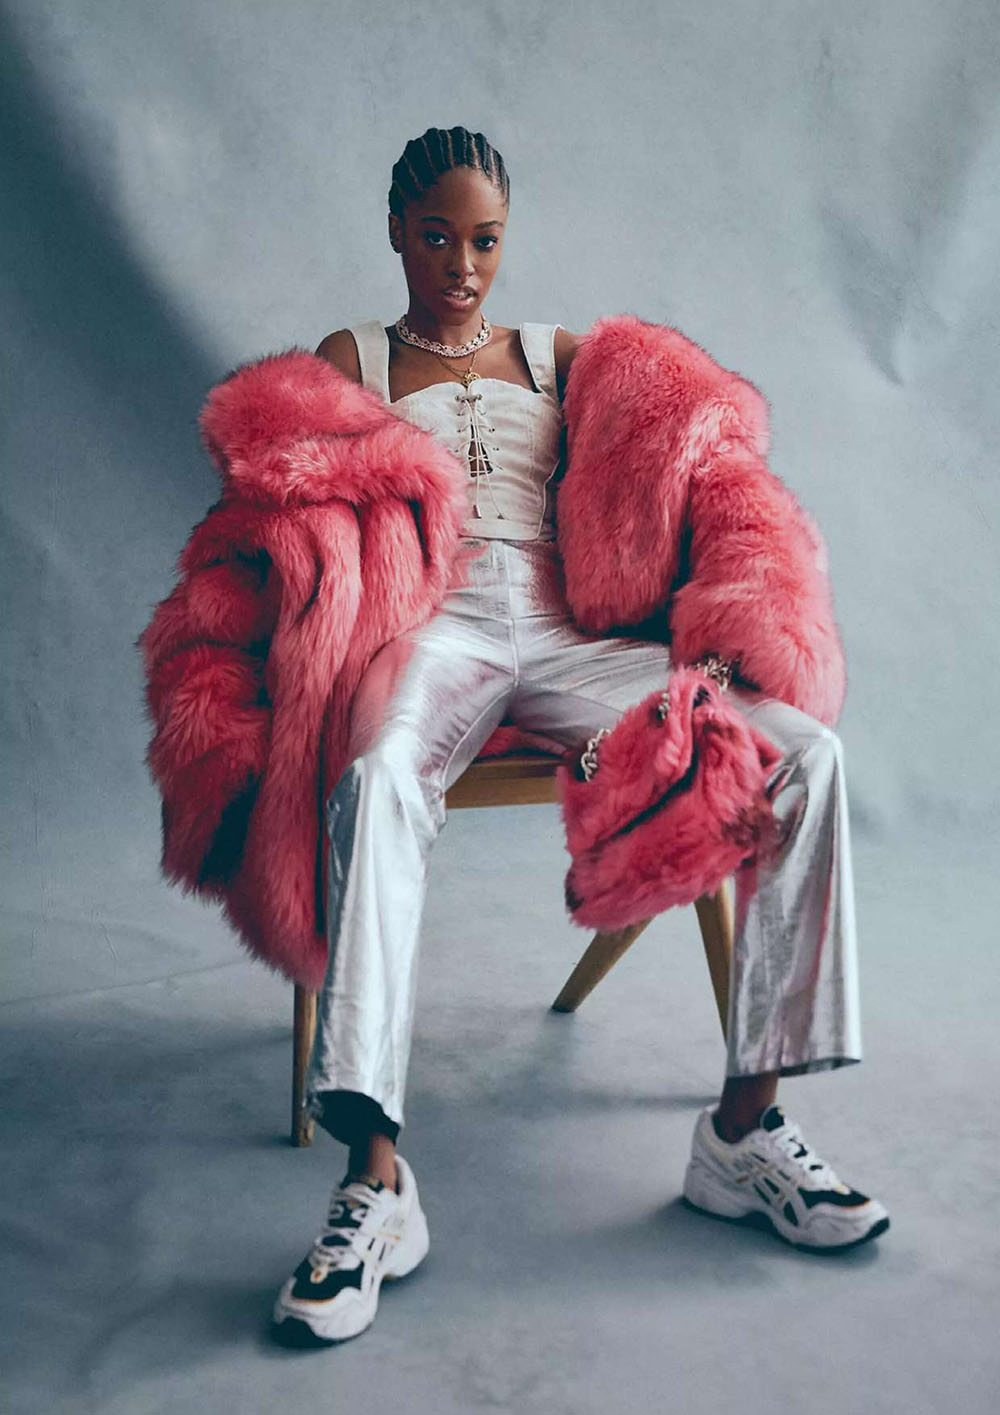 Helena Mahama by Conor Clinch for Cosmopolitan UK December 2020 January 2021